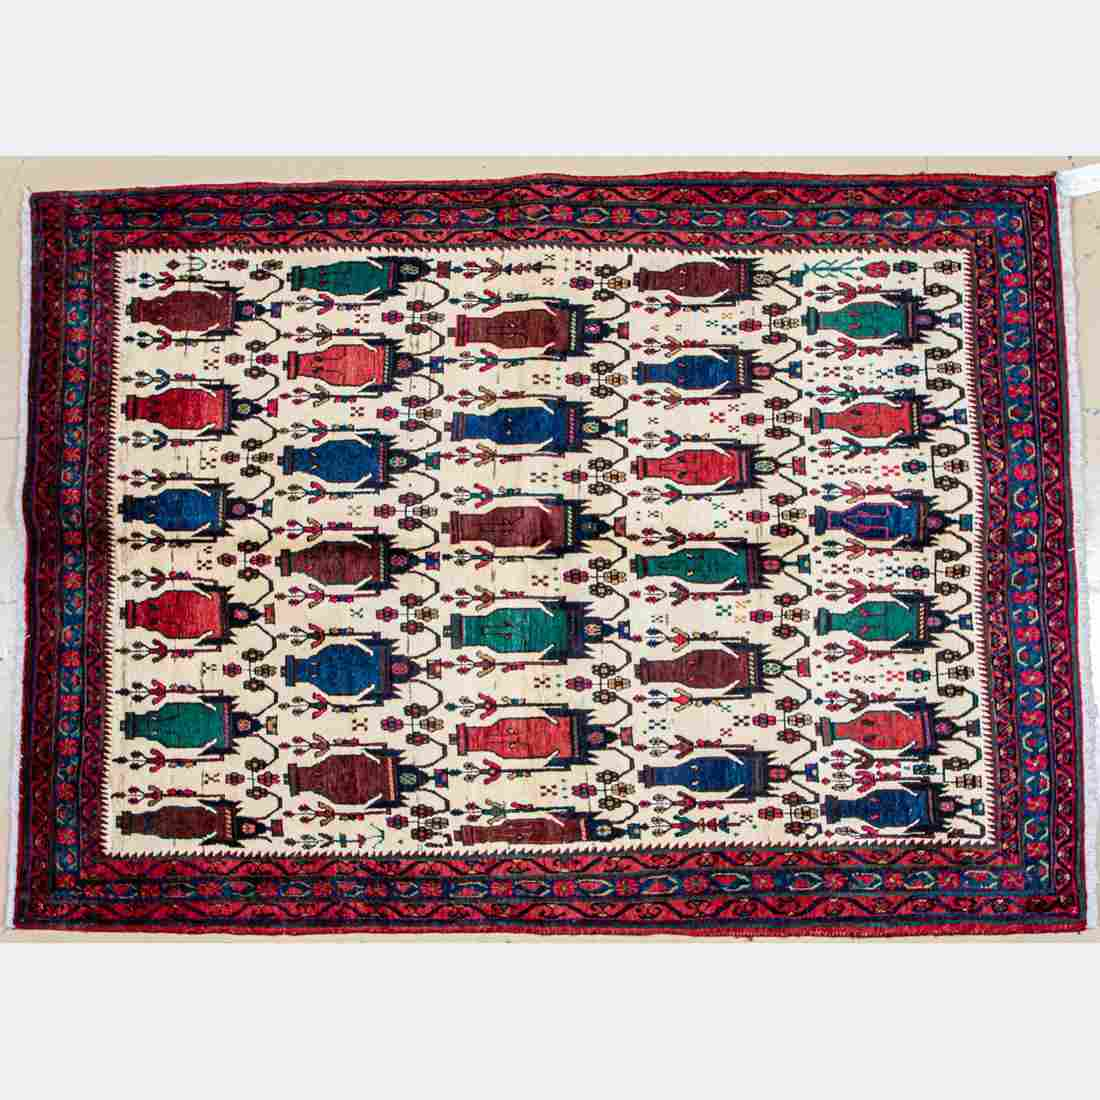 A Semi-Antique Persian Afshar Wool Rug,